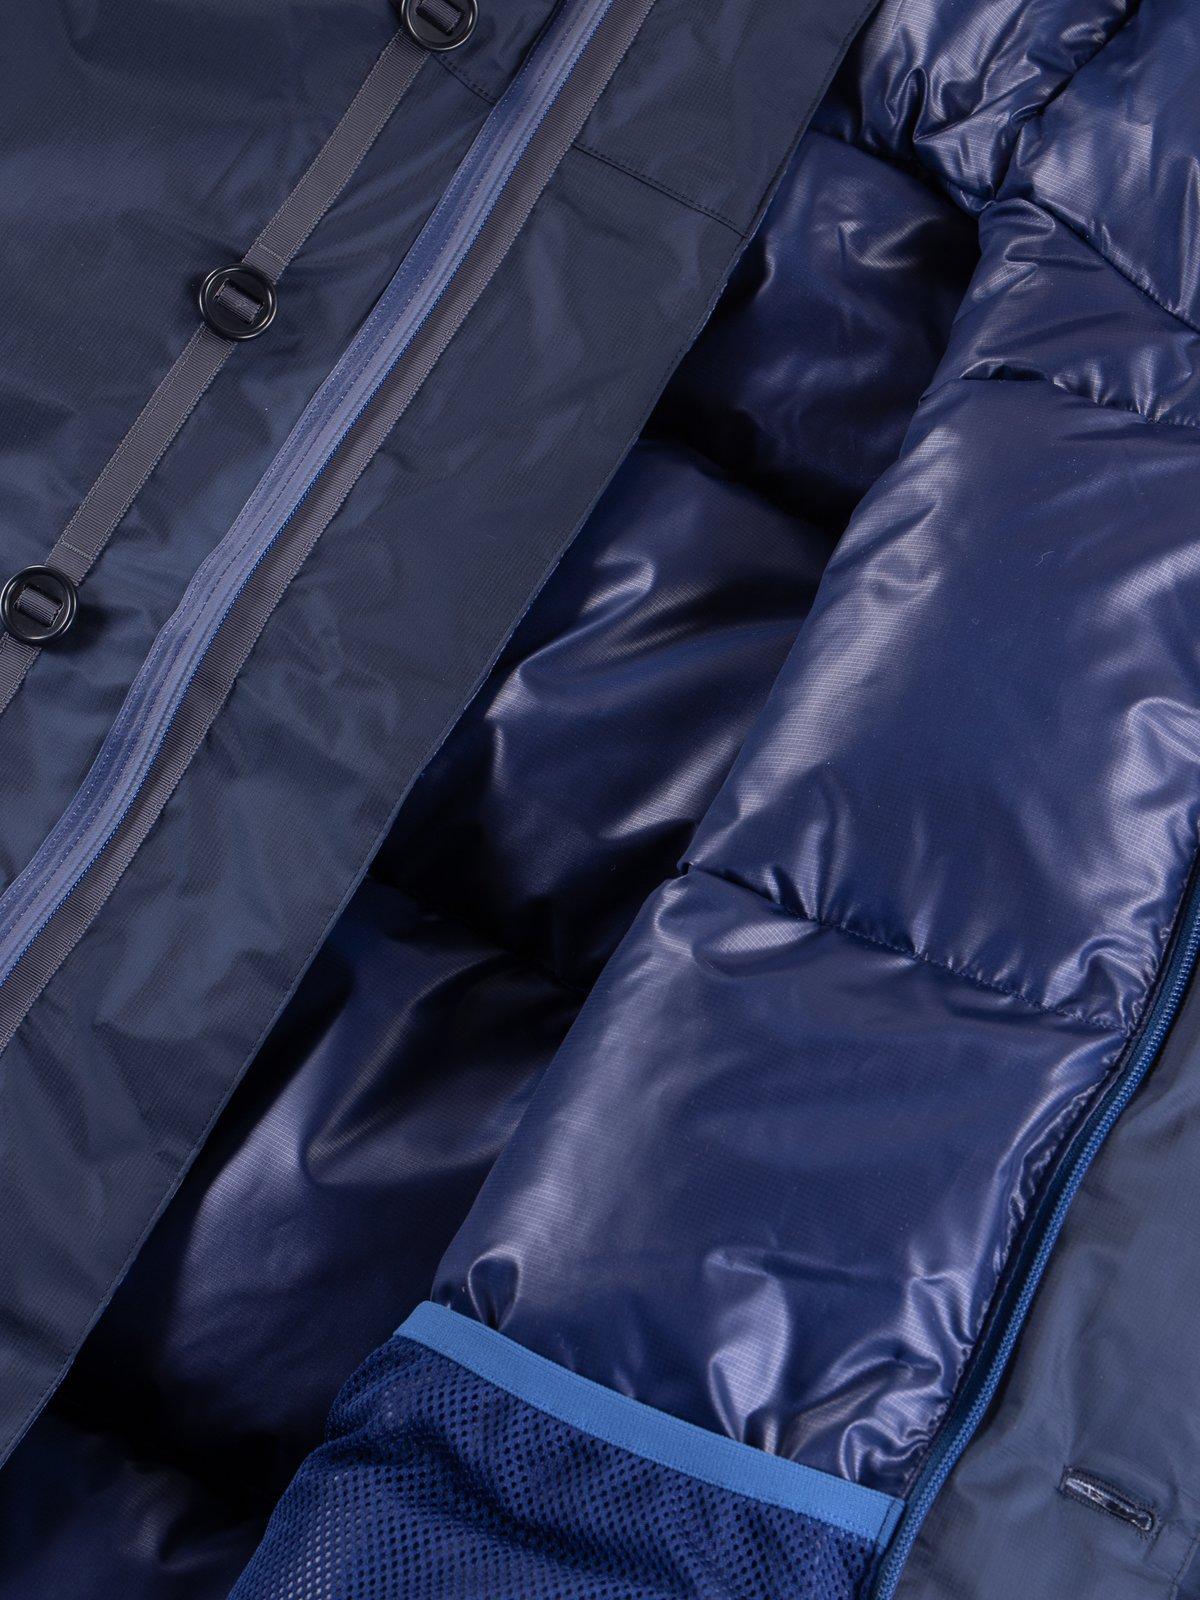 Navy/Blue Arktikal Down Jacket - Image 6